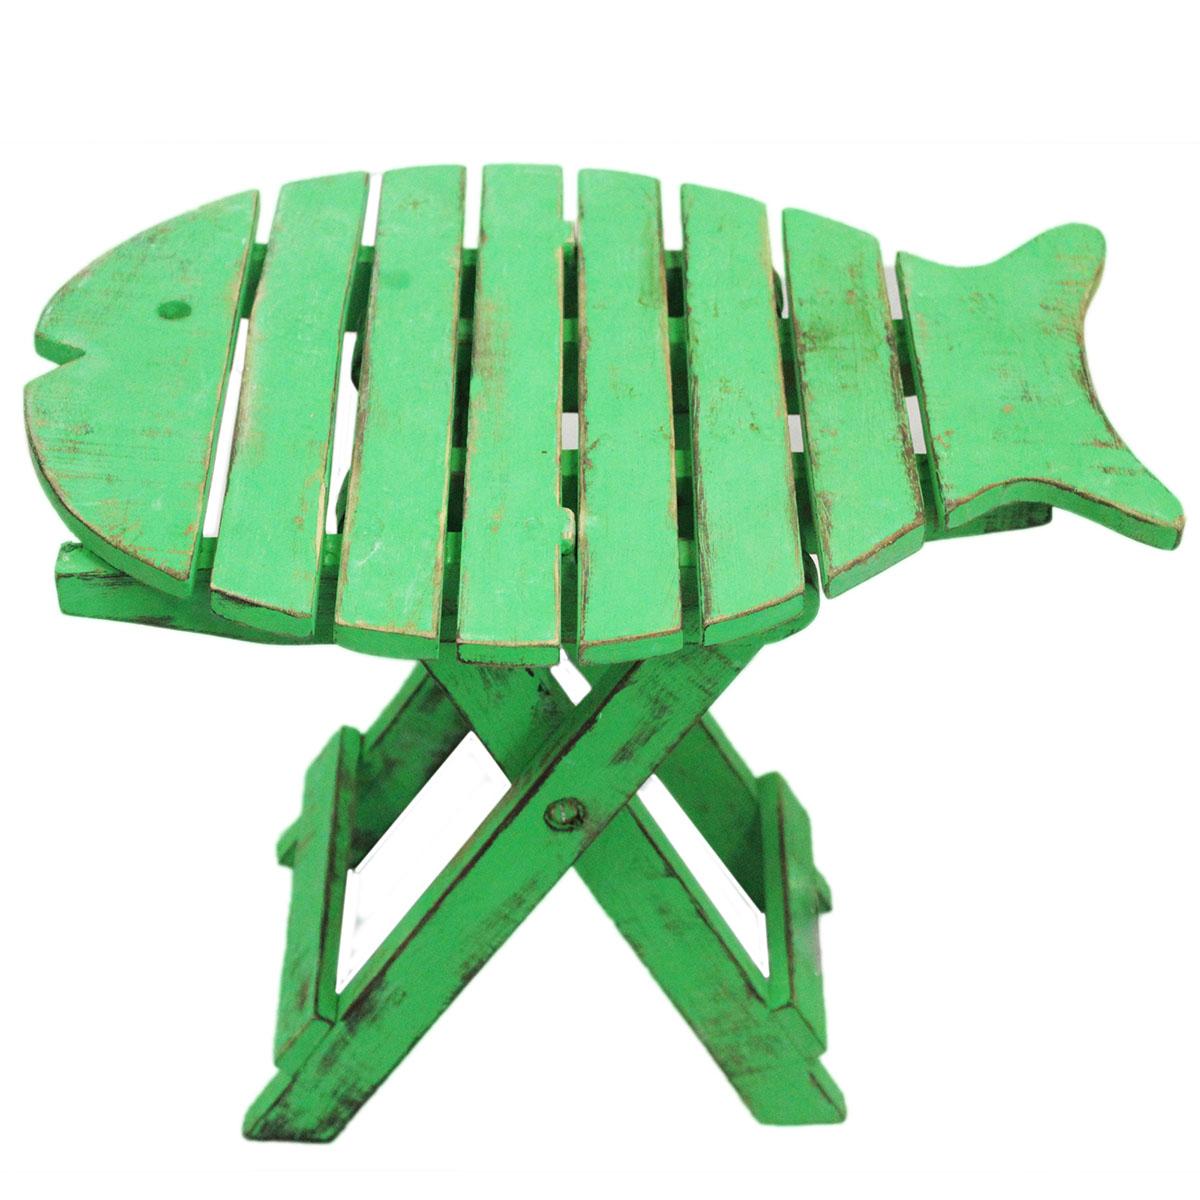 Folding Fish Chair - Green Wash